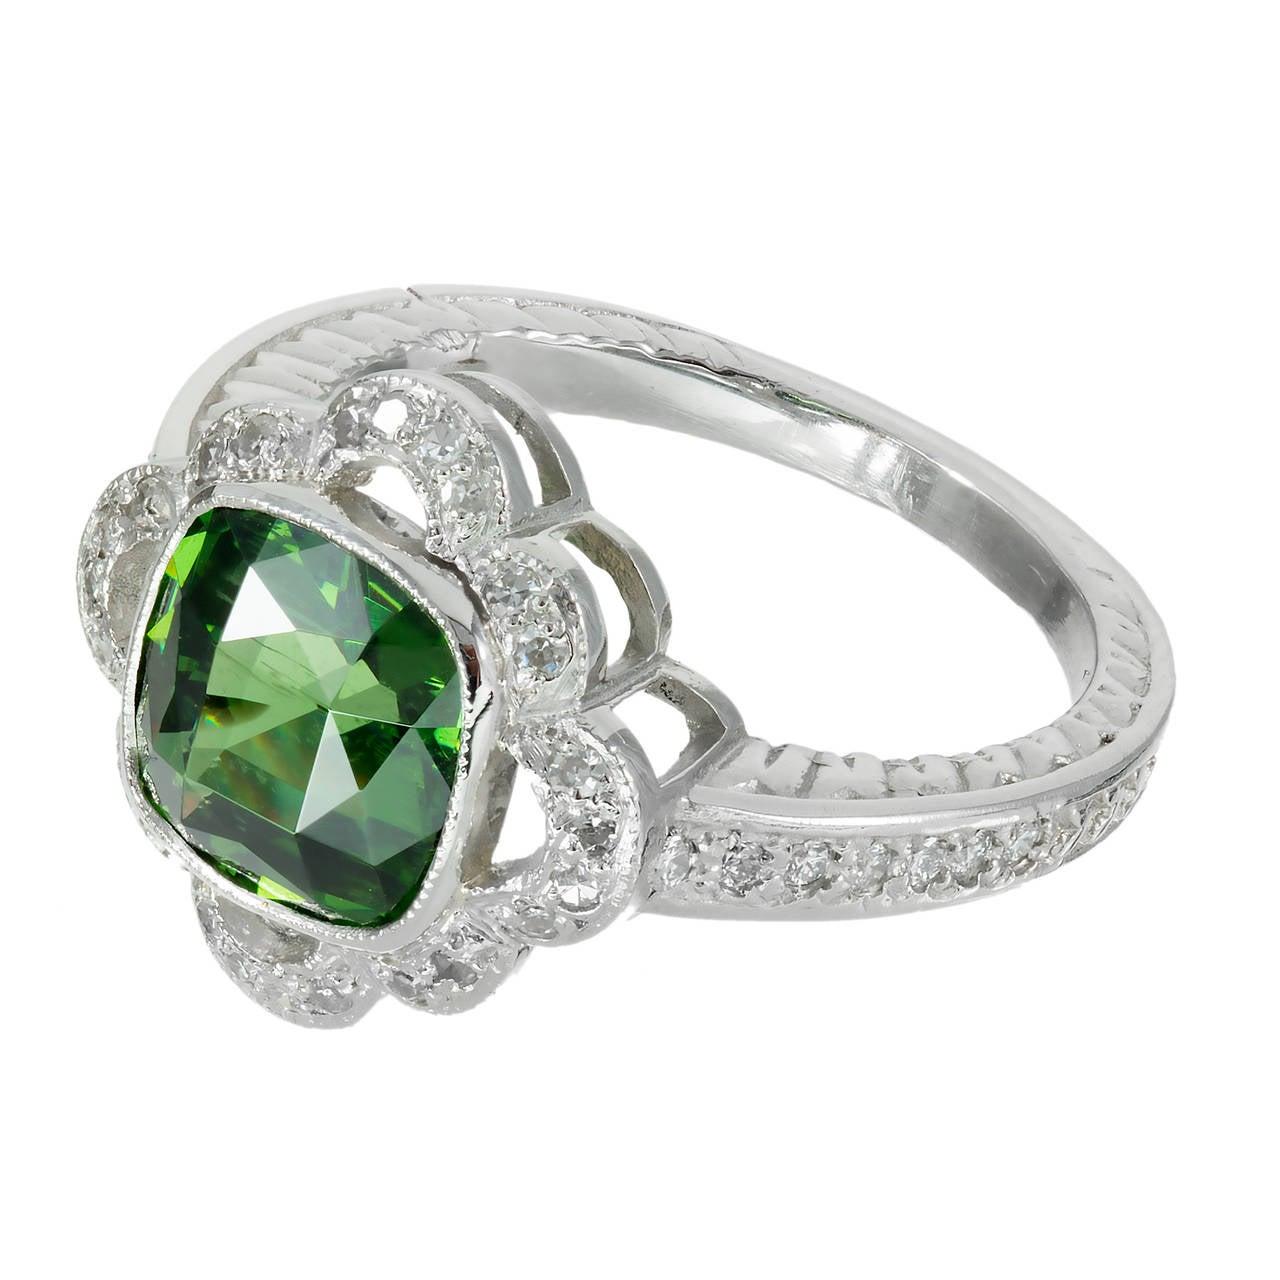 Green Zircon Diamond Platinum Engagement Ring